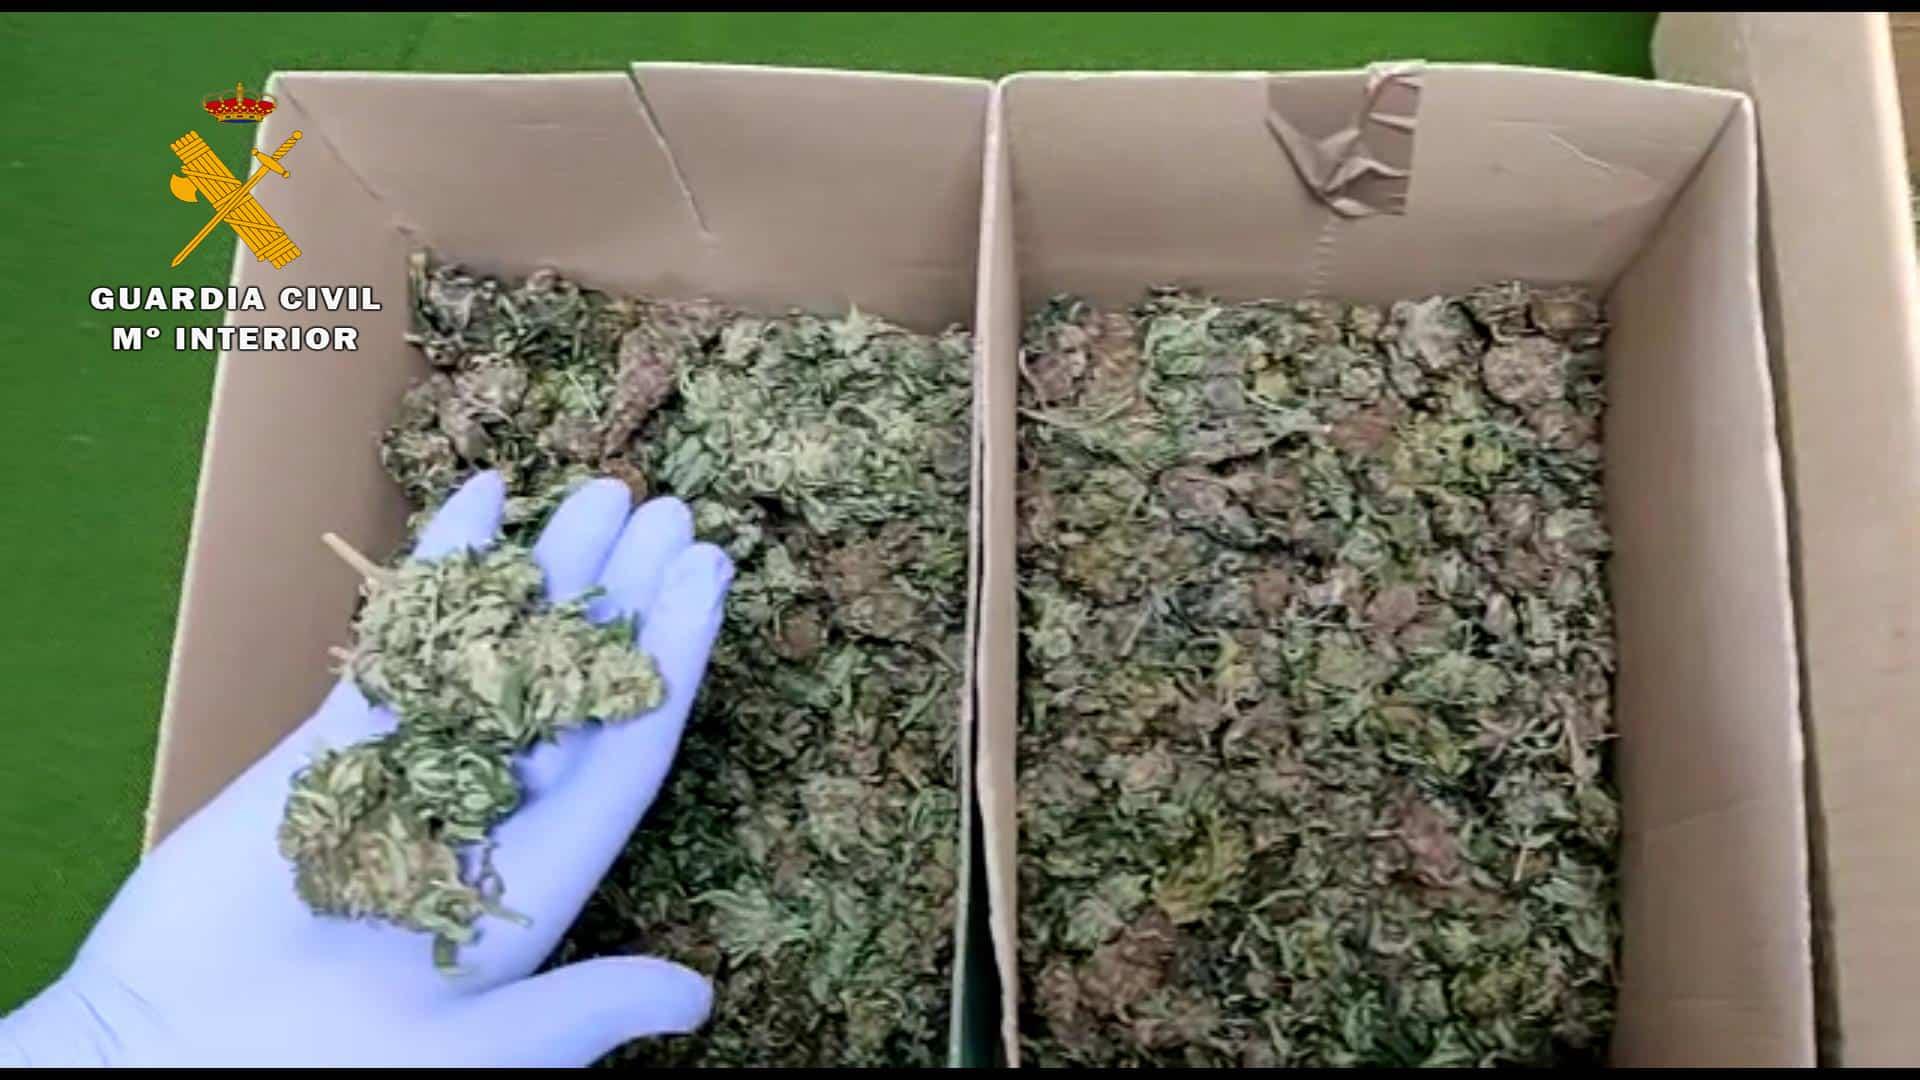 La Guardia Civil descubre varias plantas de marihuana en el interior de una finca de Alcanadre 2